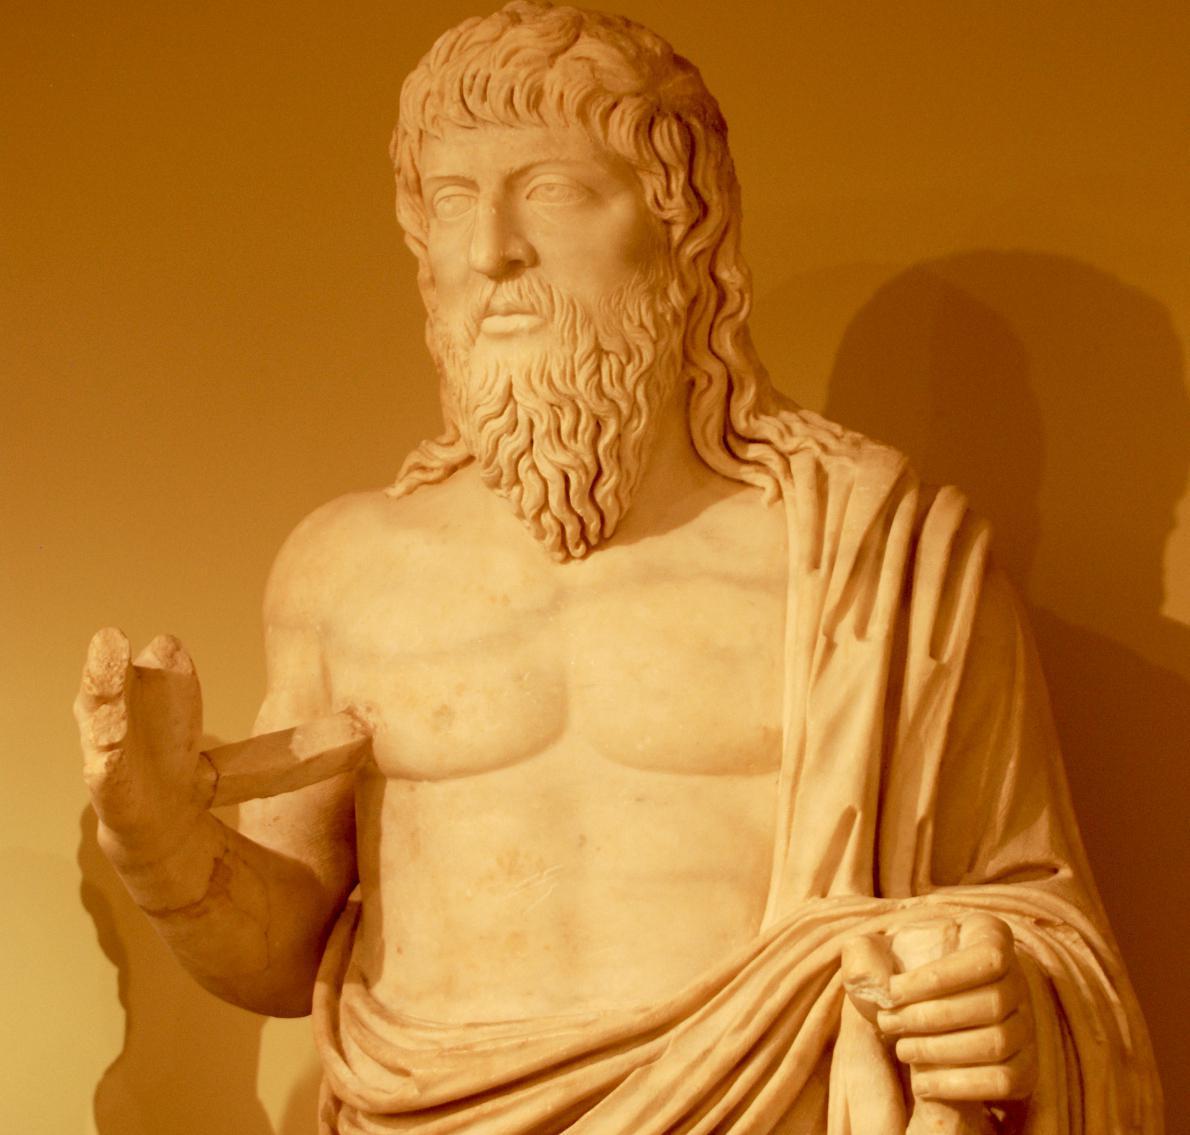 The_Philosopher_Apollonius_of_Tyana_-_Archaeological_Museum_of_Herakleion